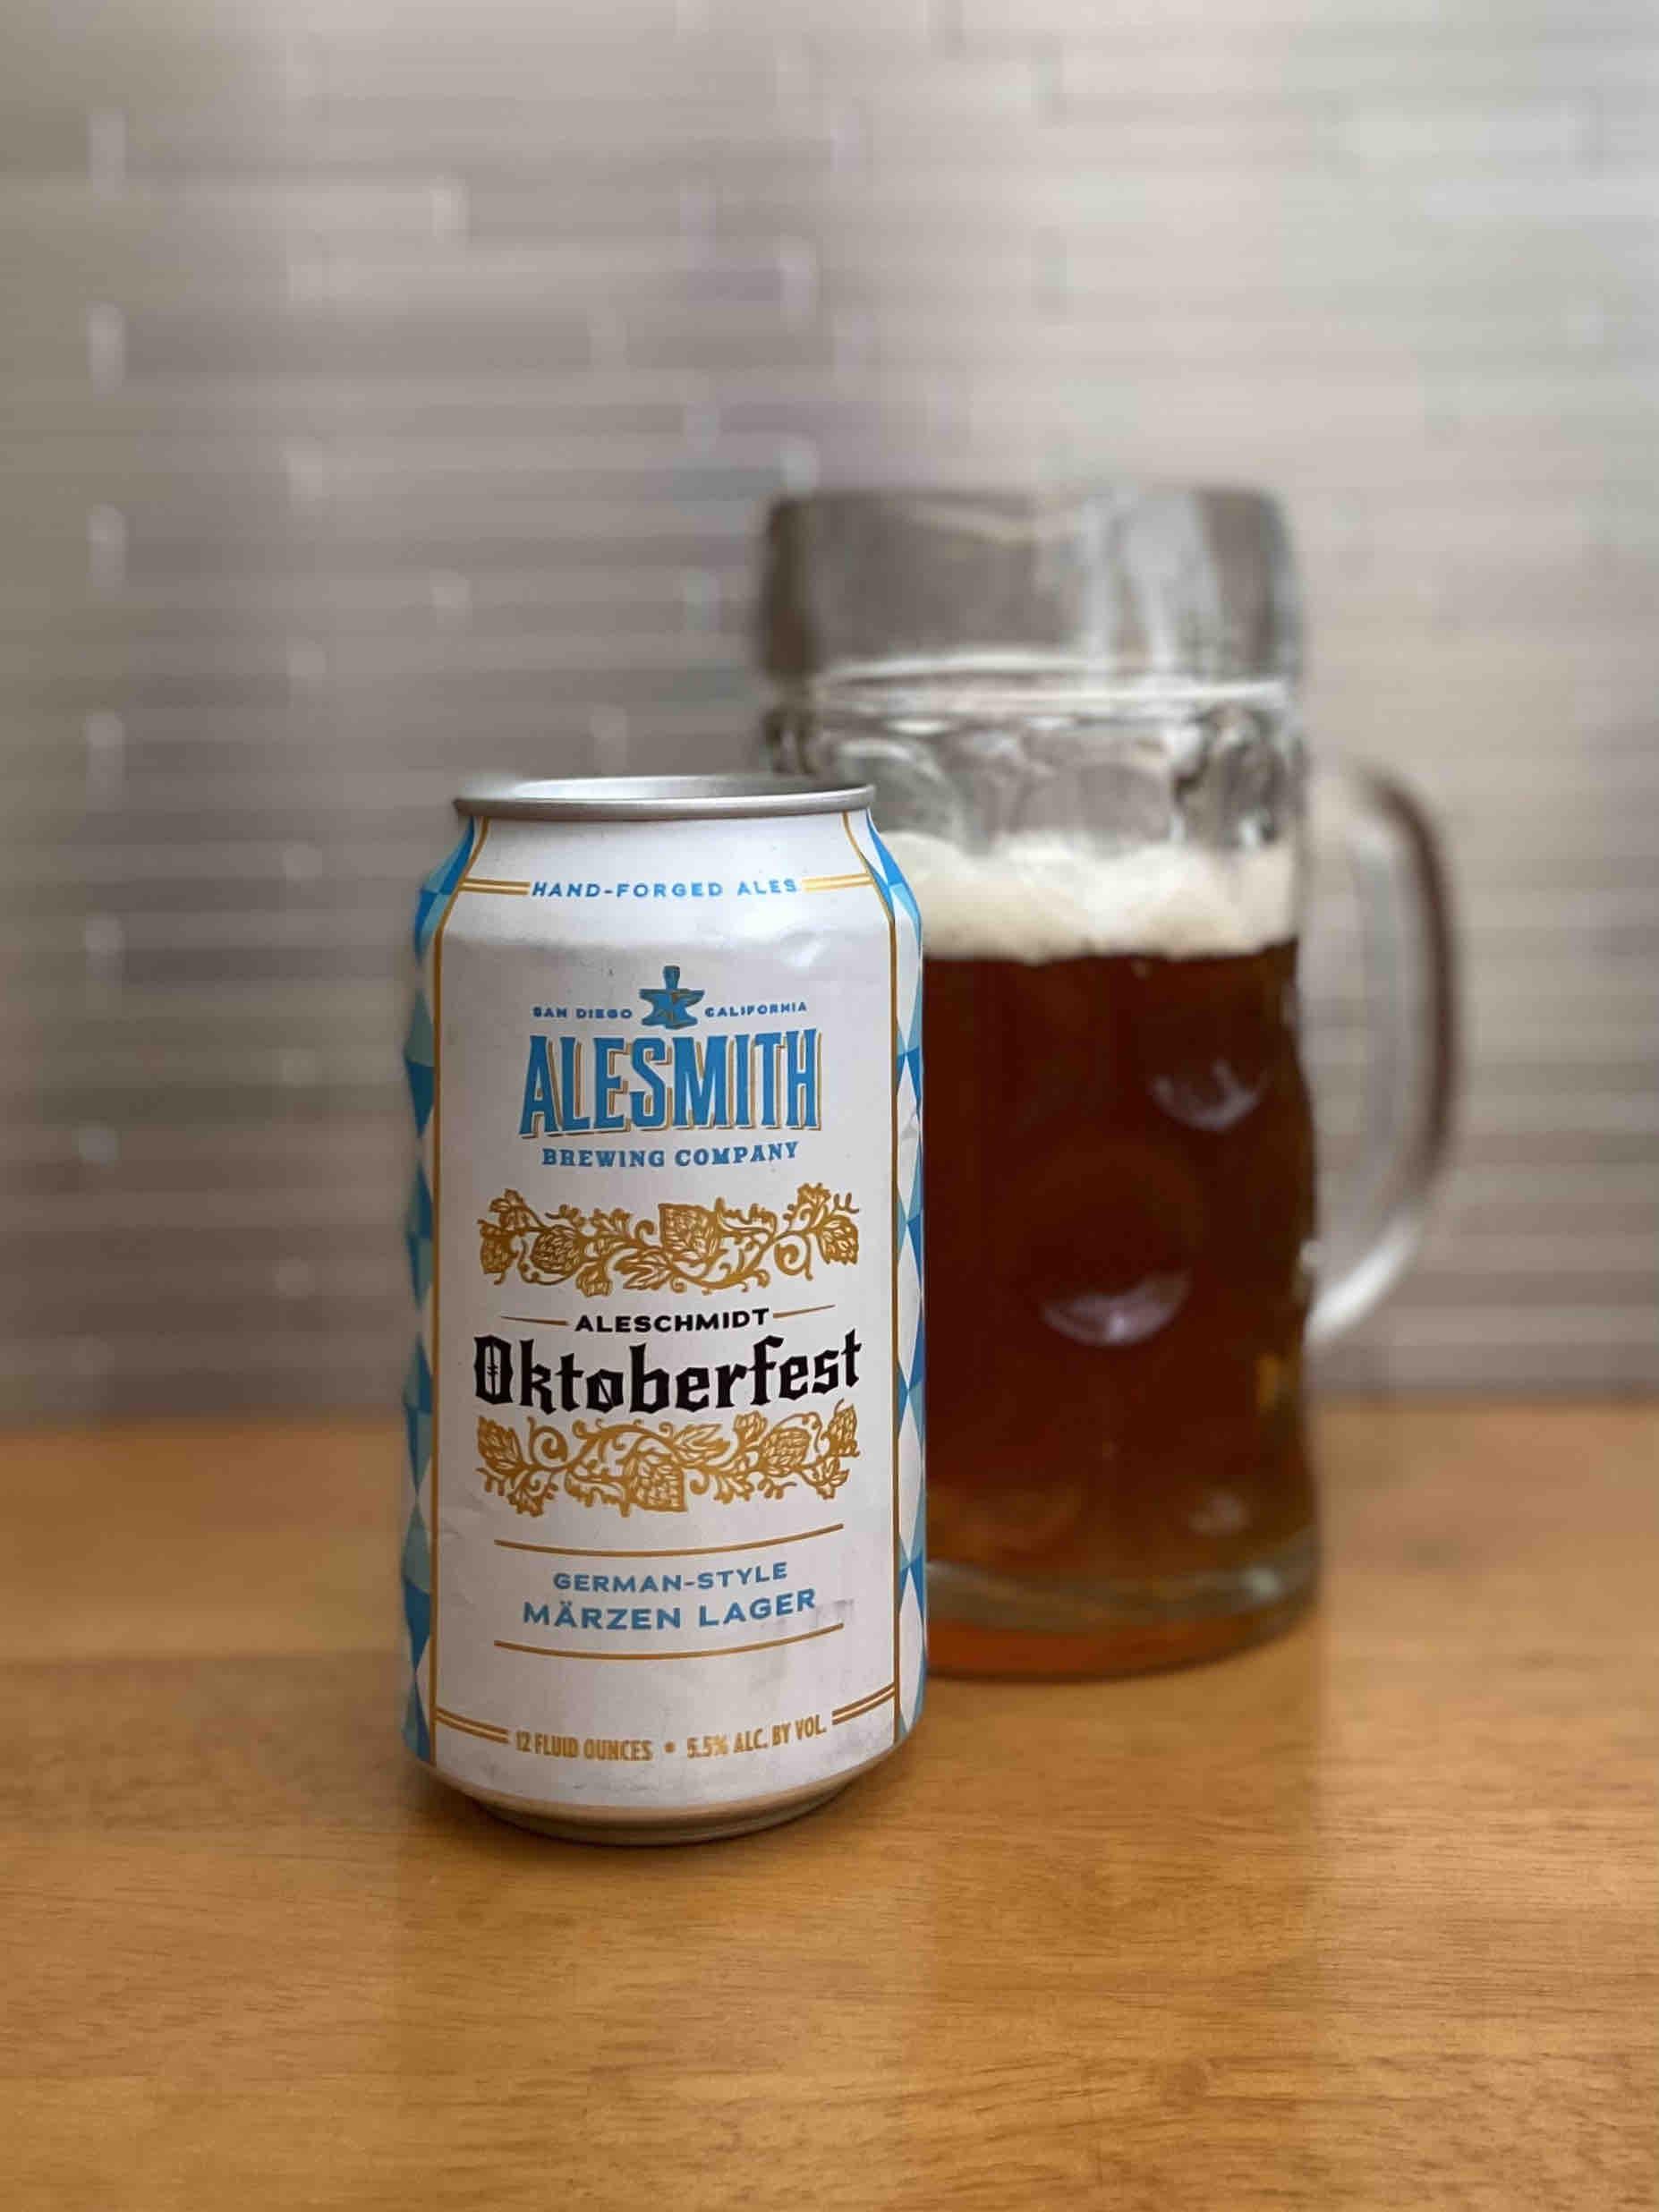 AleSmith Brewing releases AleSchmidt Oktoberfest Märzen in 12oz cans.